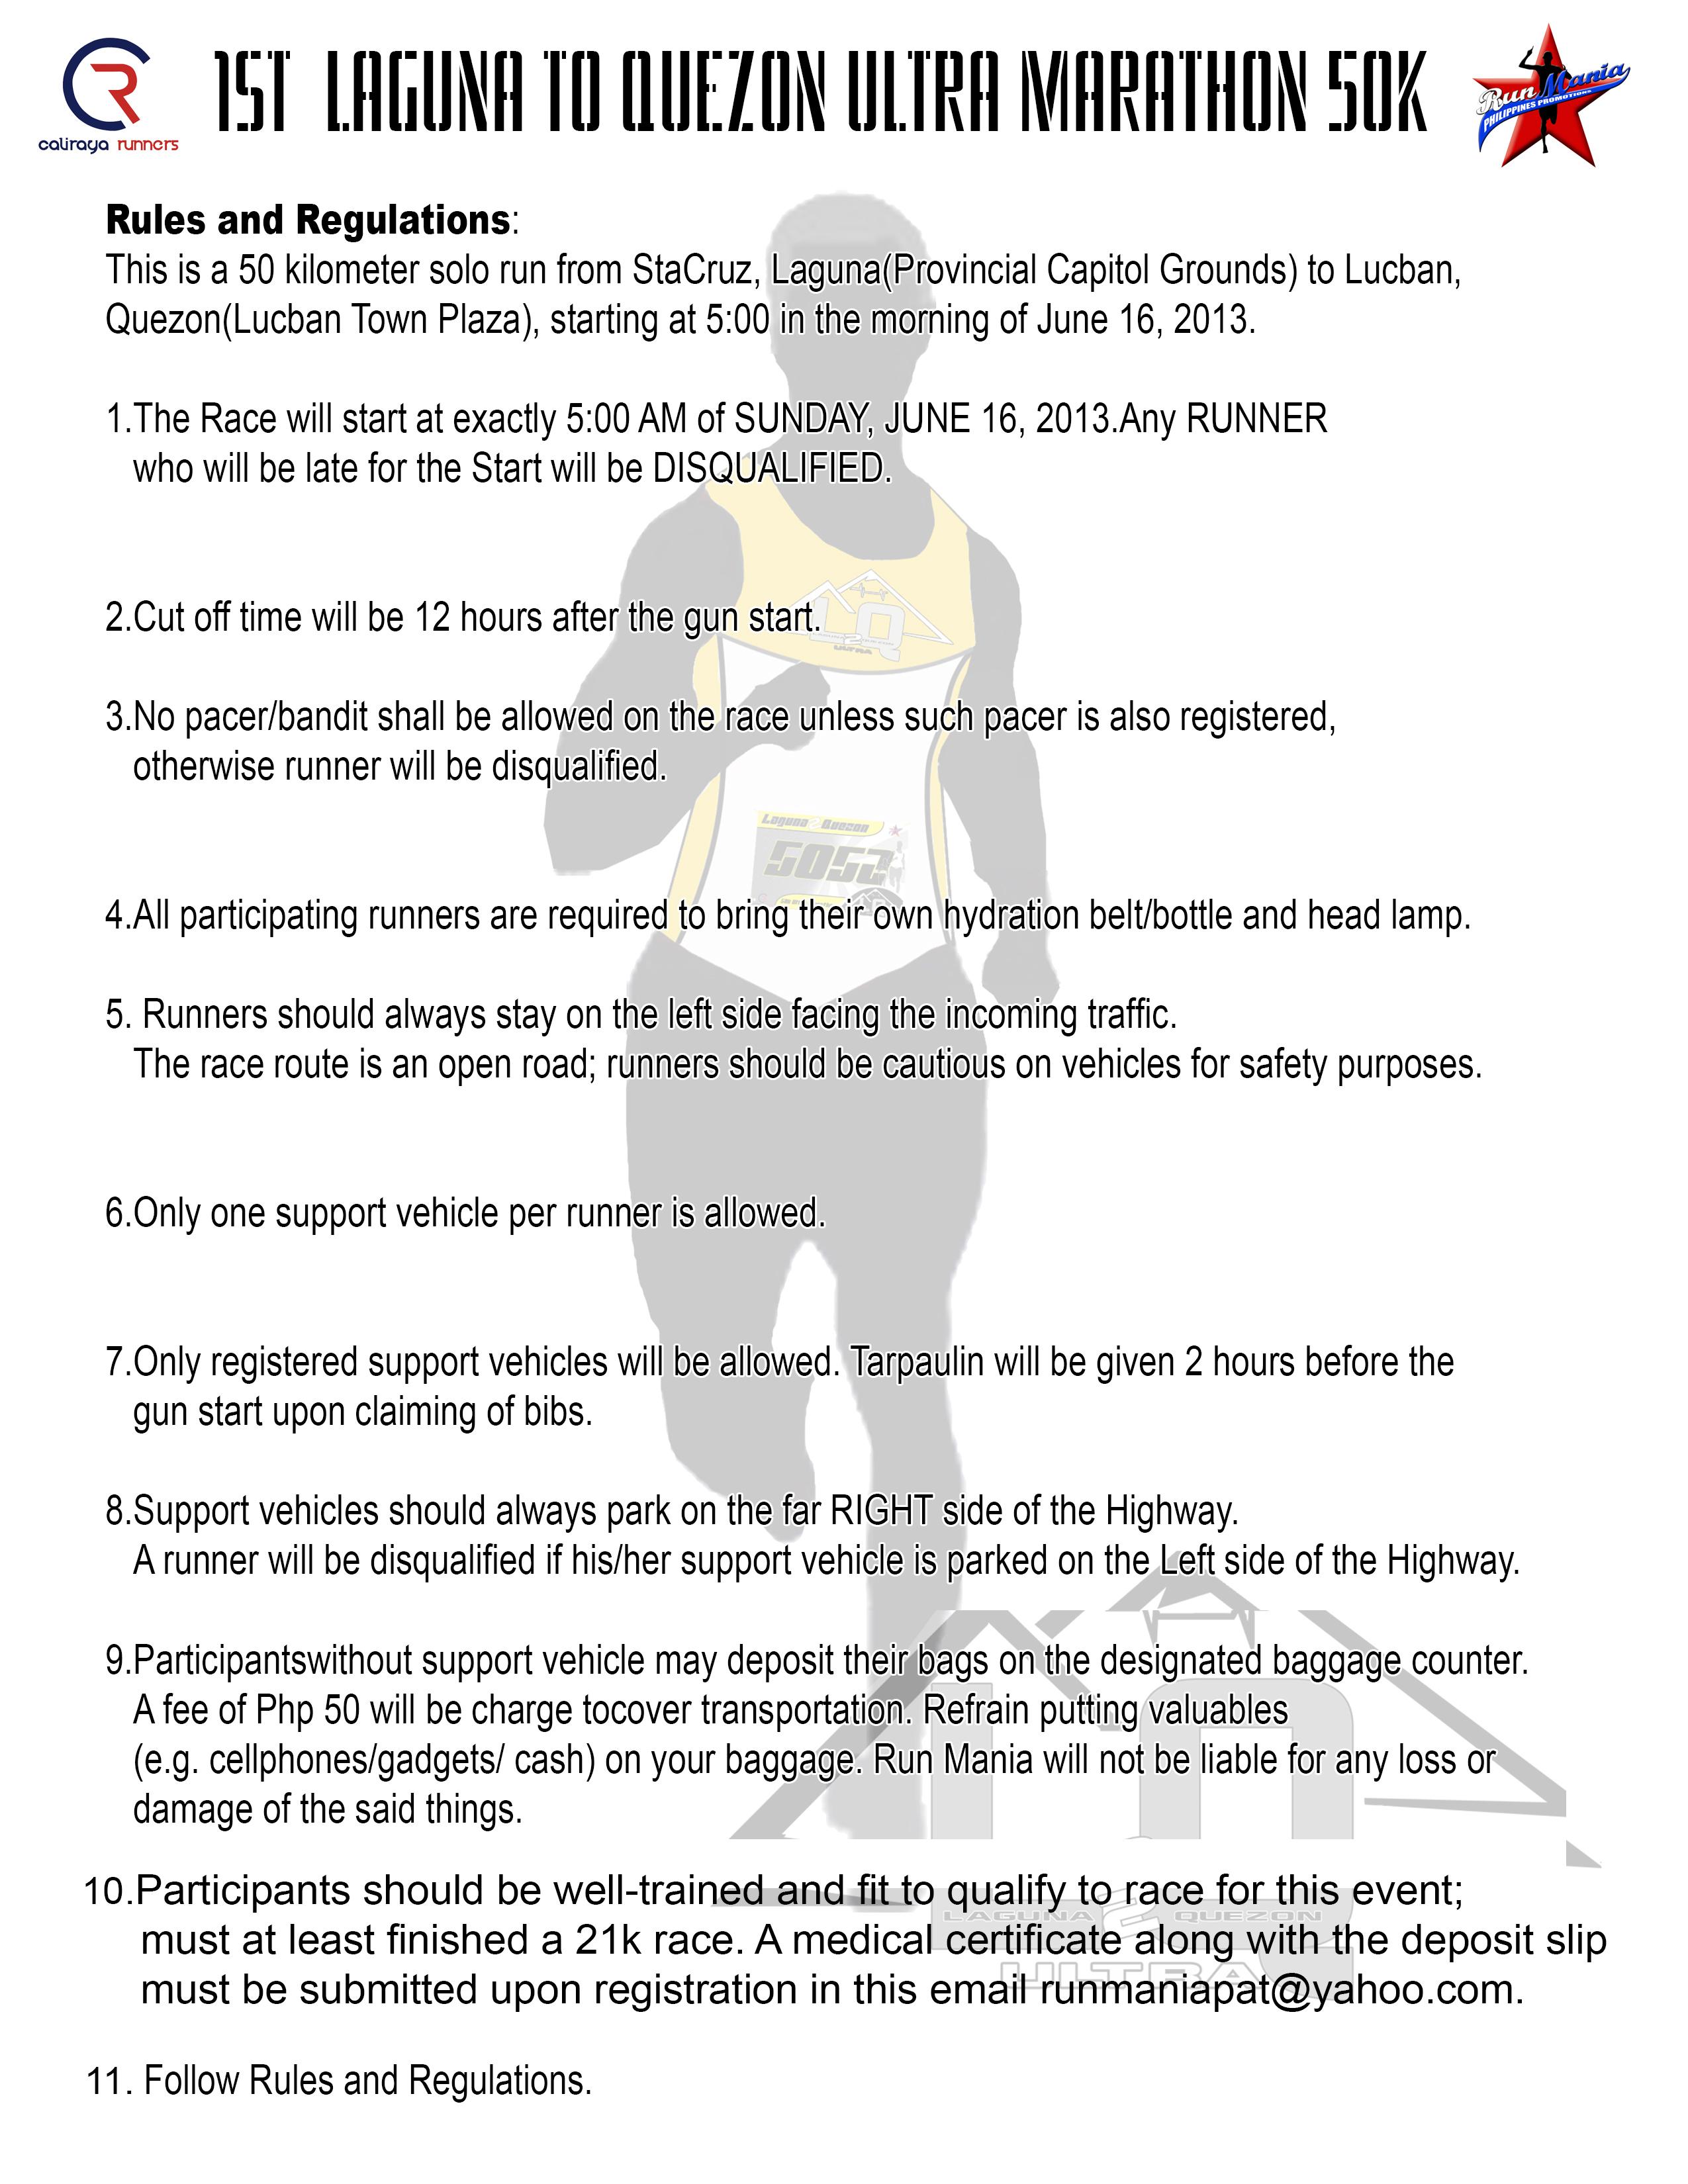 laguna-to-quezon-50k-ultra-marathon-2013-rules